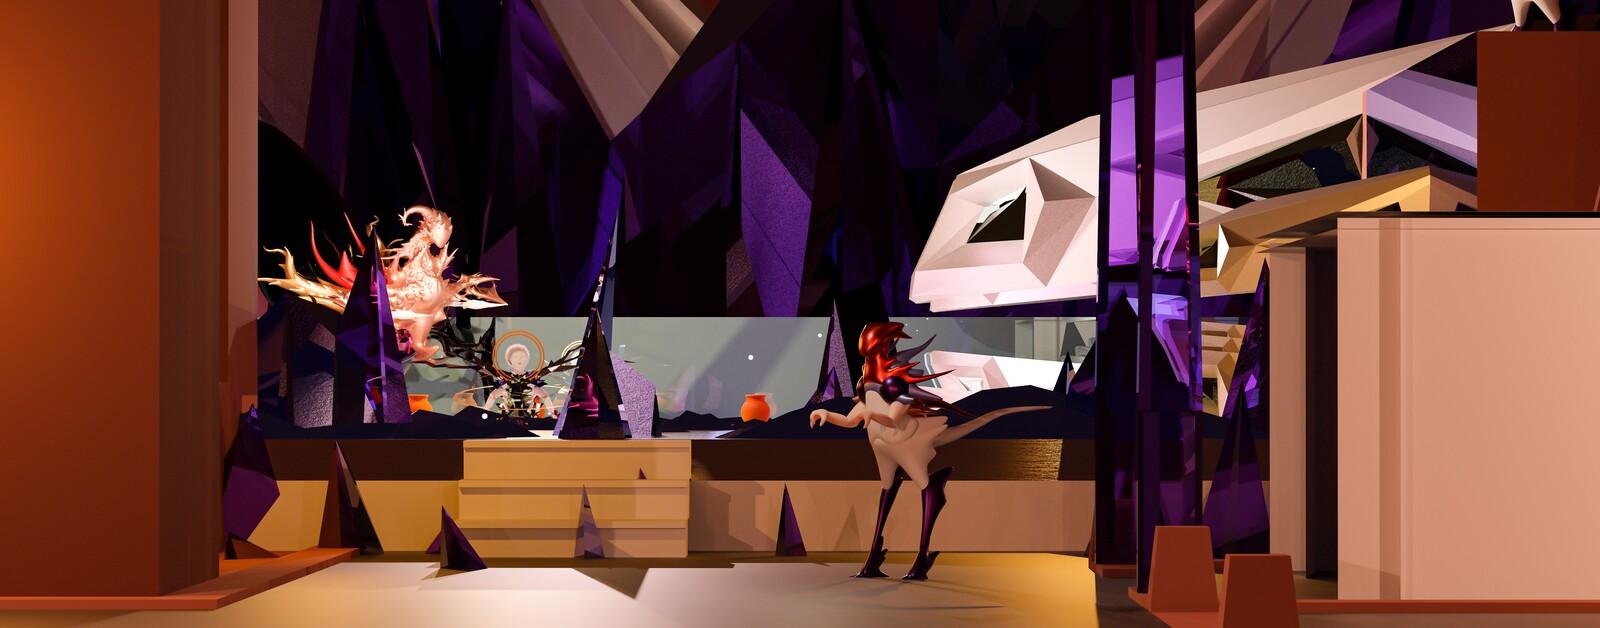 Faceless Ruby Glass Celestial Plane Scene Mockup